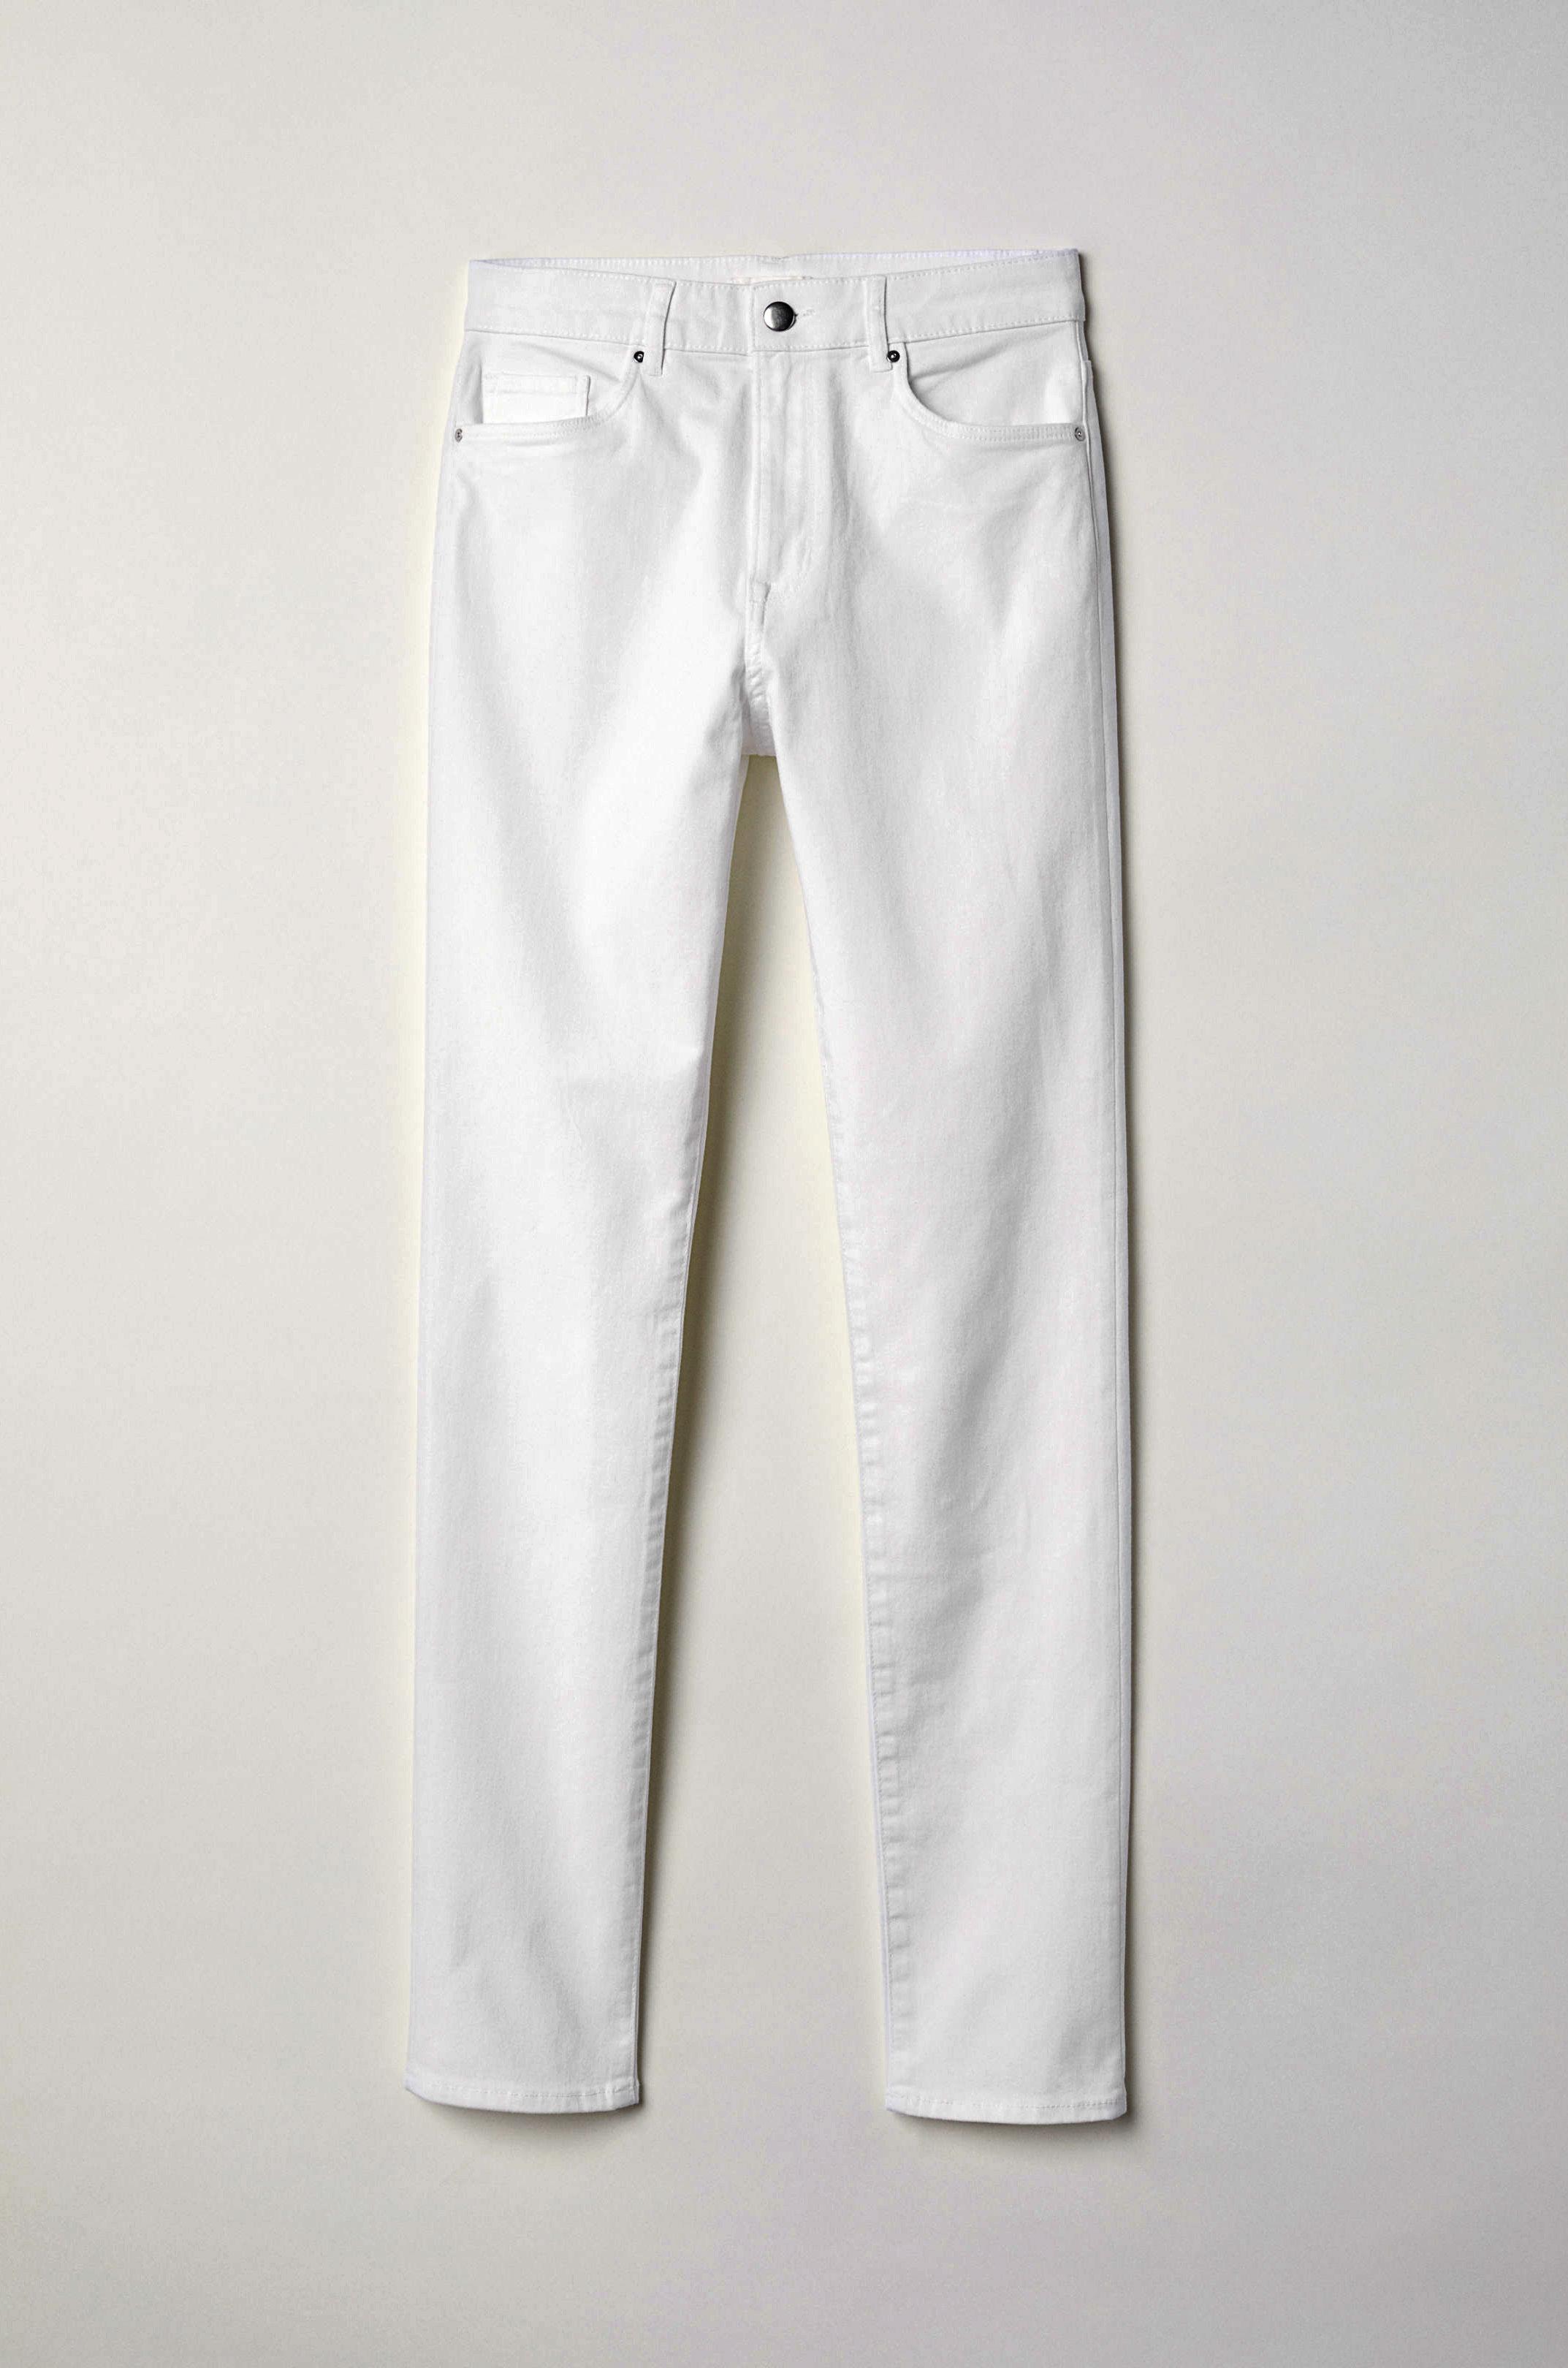 H&M Winter White Pant     $19.99